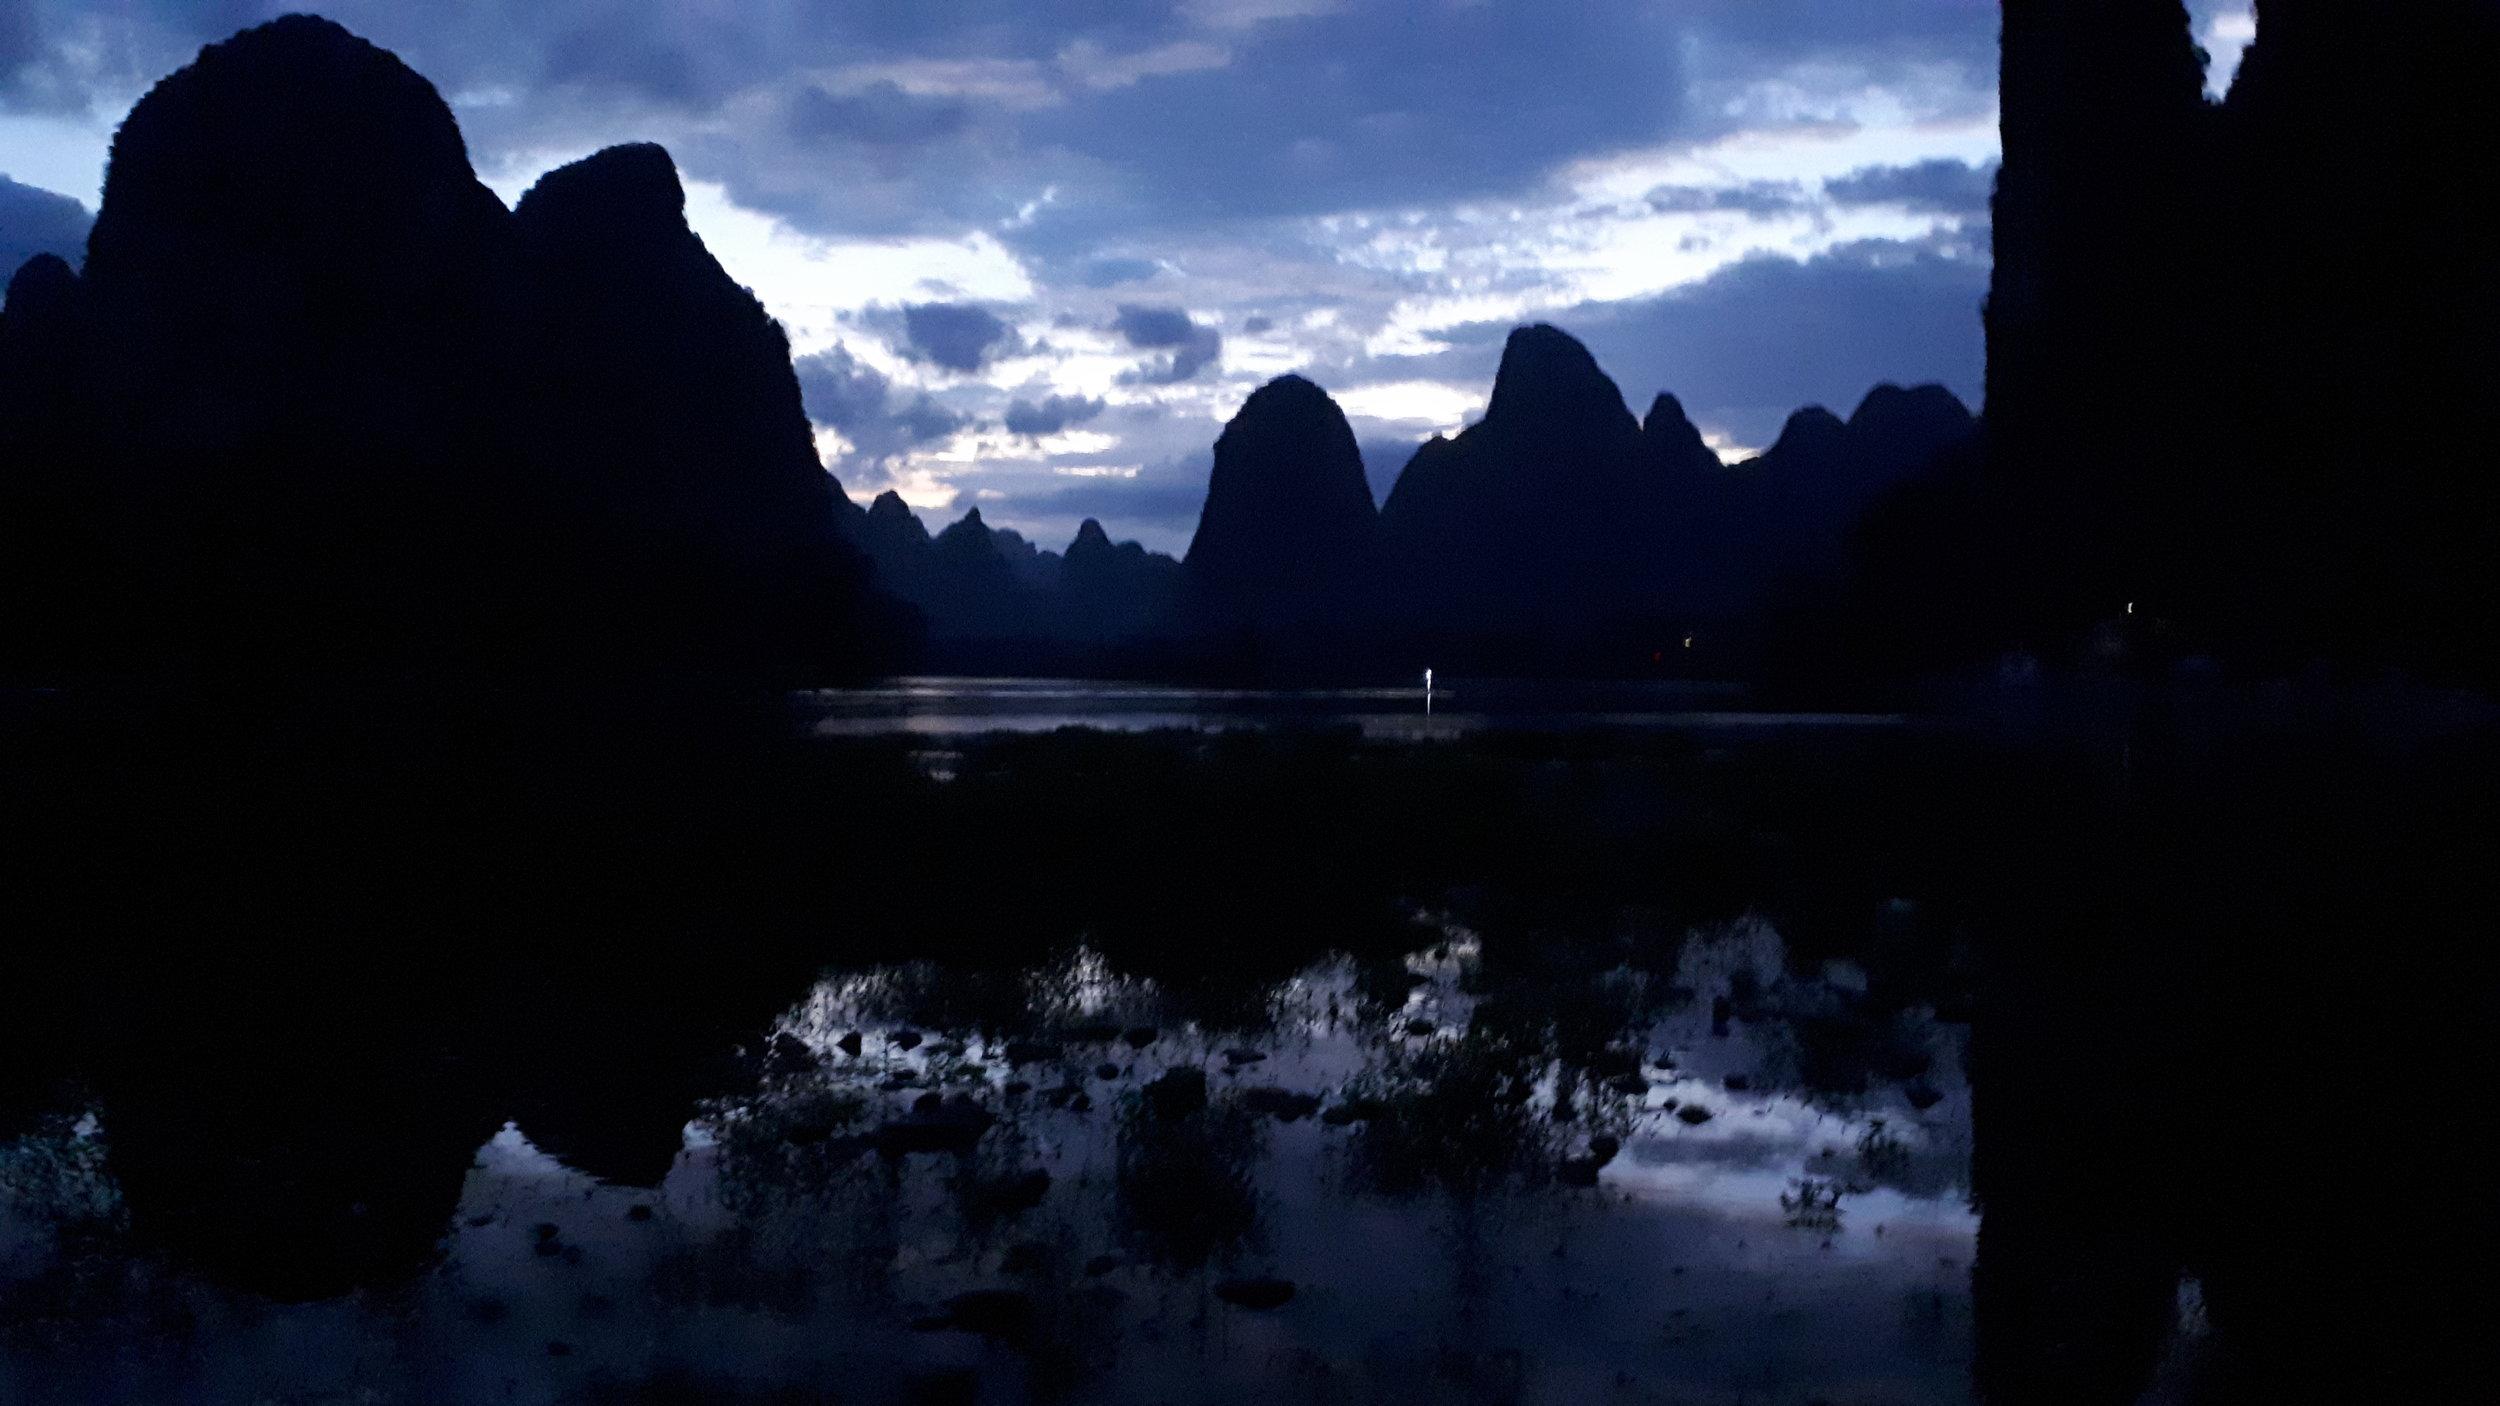 Blue hour light silhouetting the karst limestone mountains